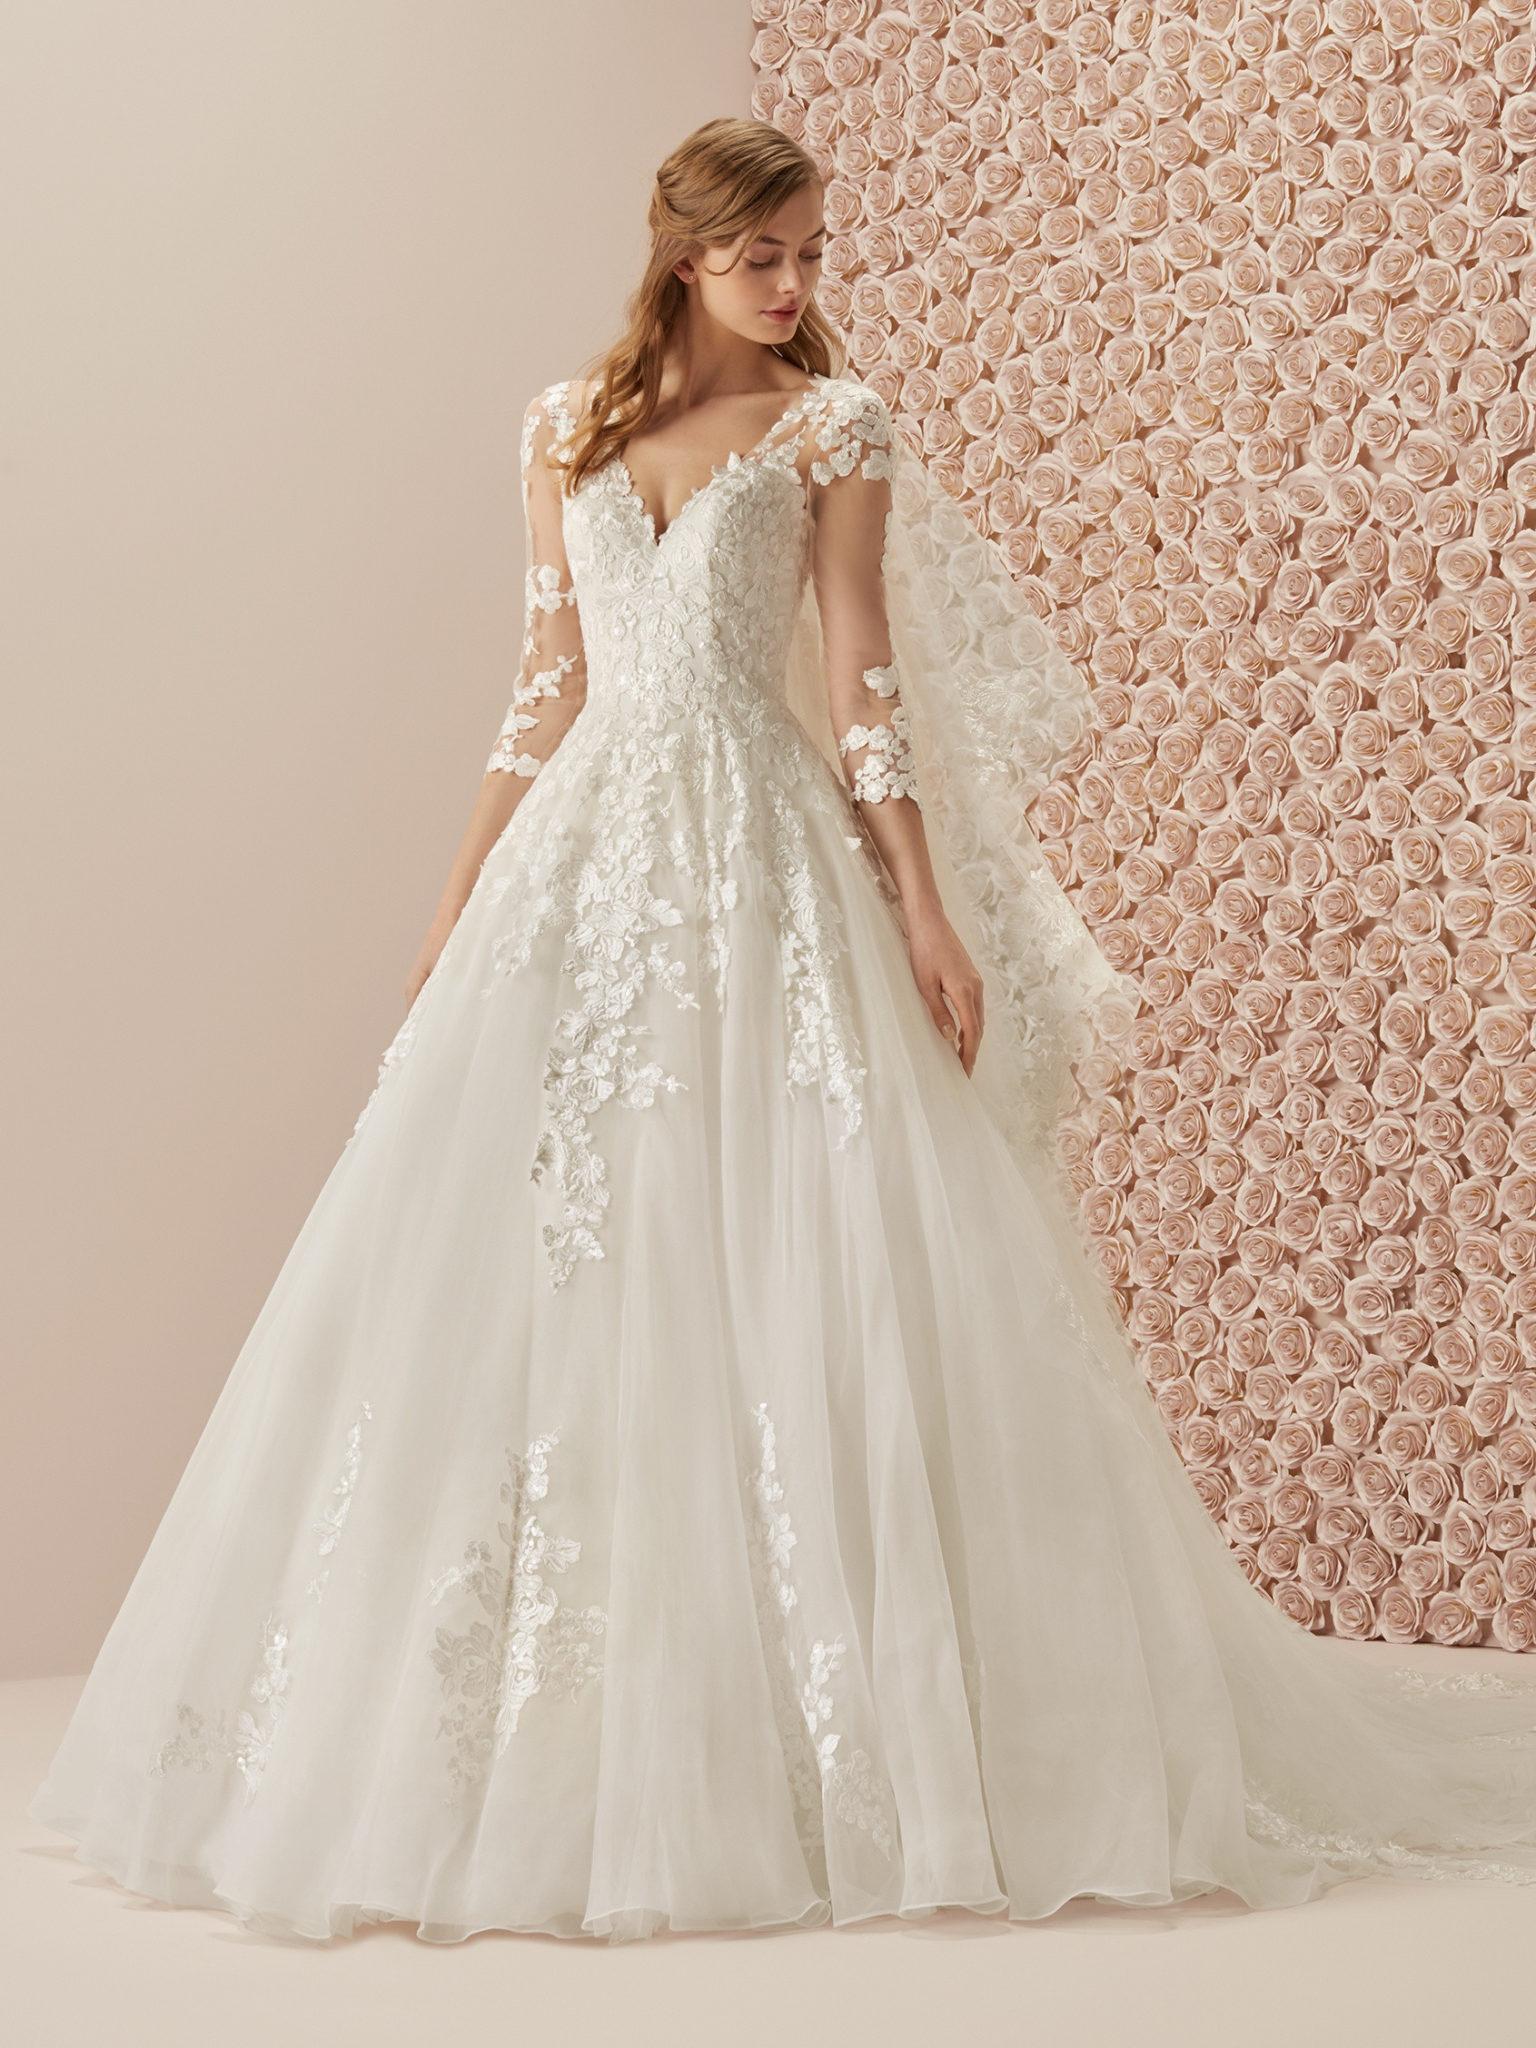 Medas By Pronovias Wedding Dress On Sale At Precious Memories Bridal